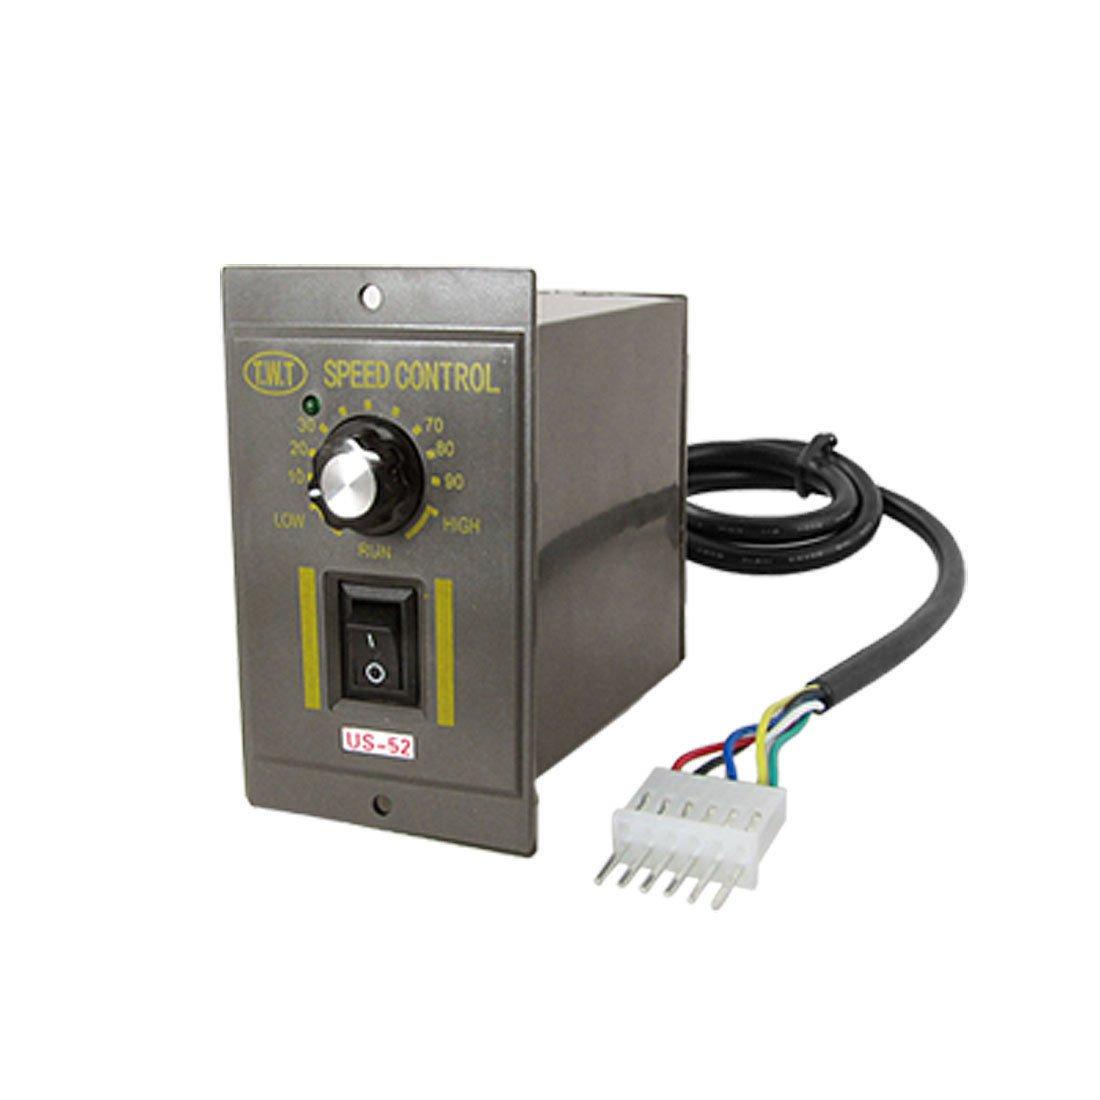 AC 220V 120W Electric Gear Motor Speed Controller US-52